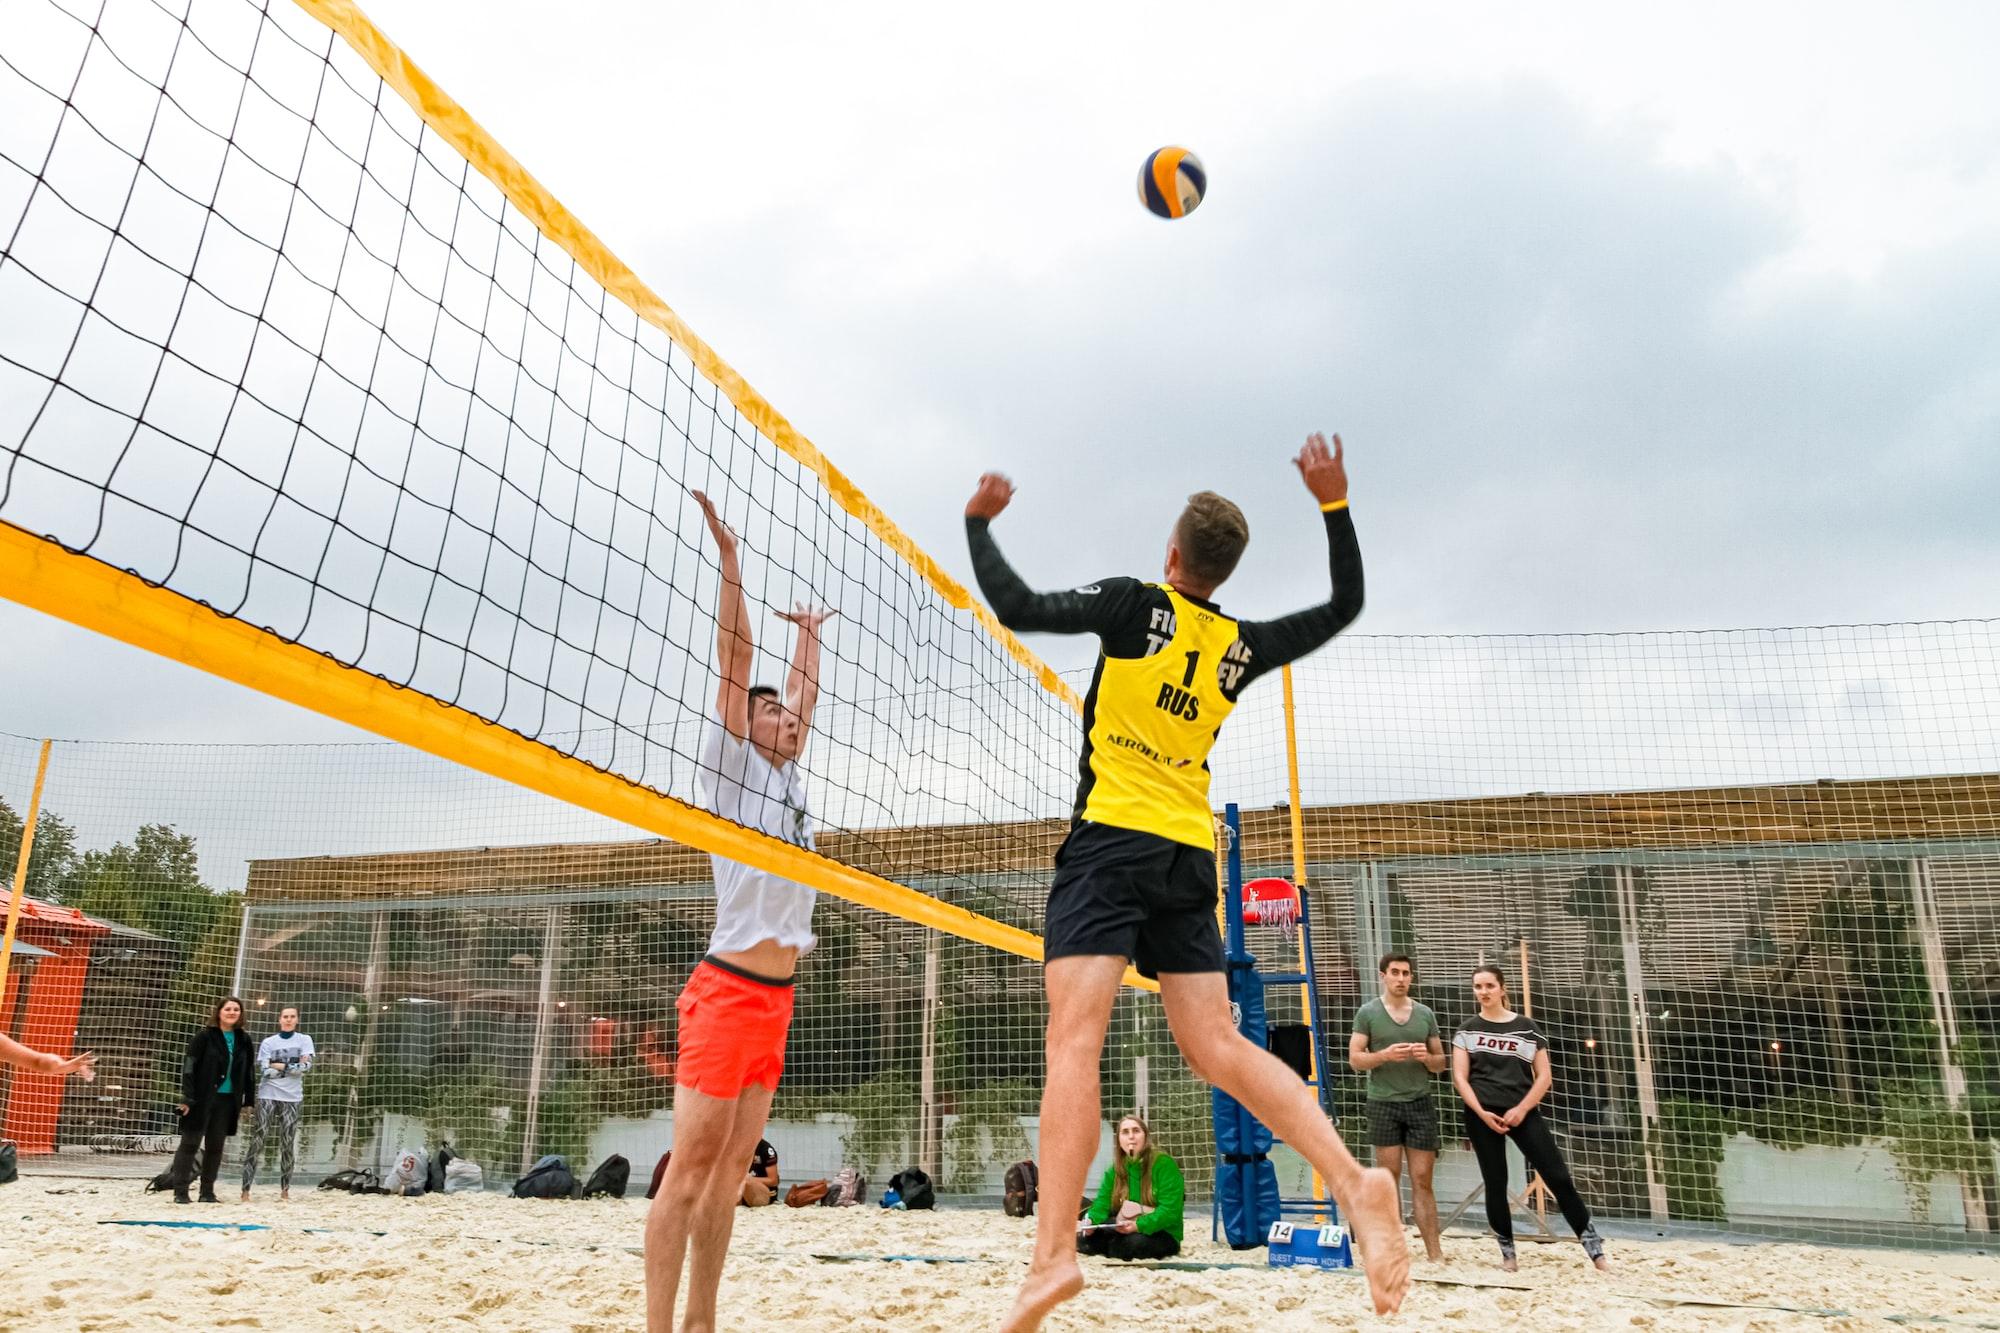 #sport #volleyball